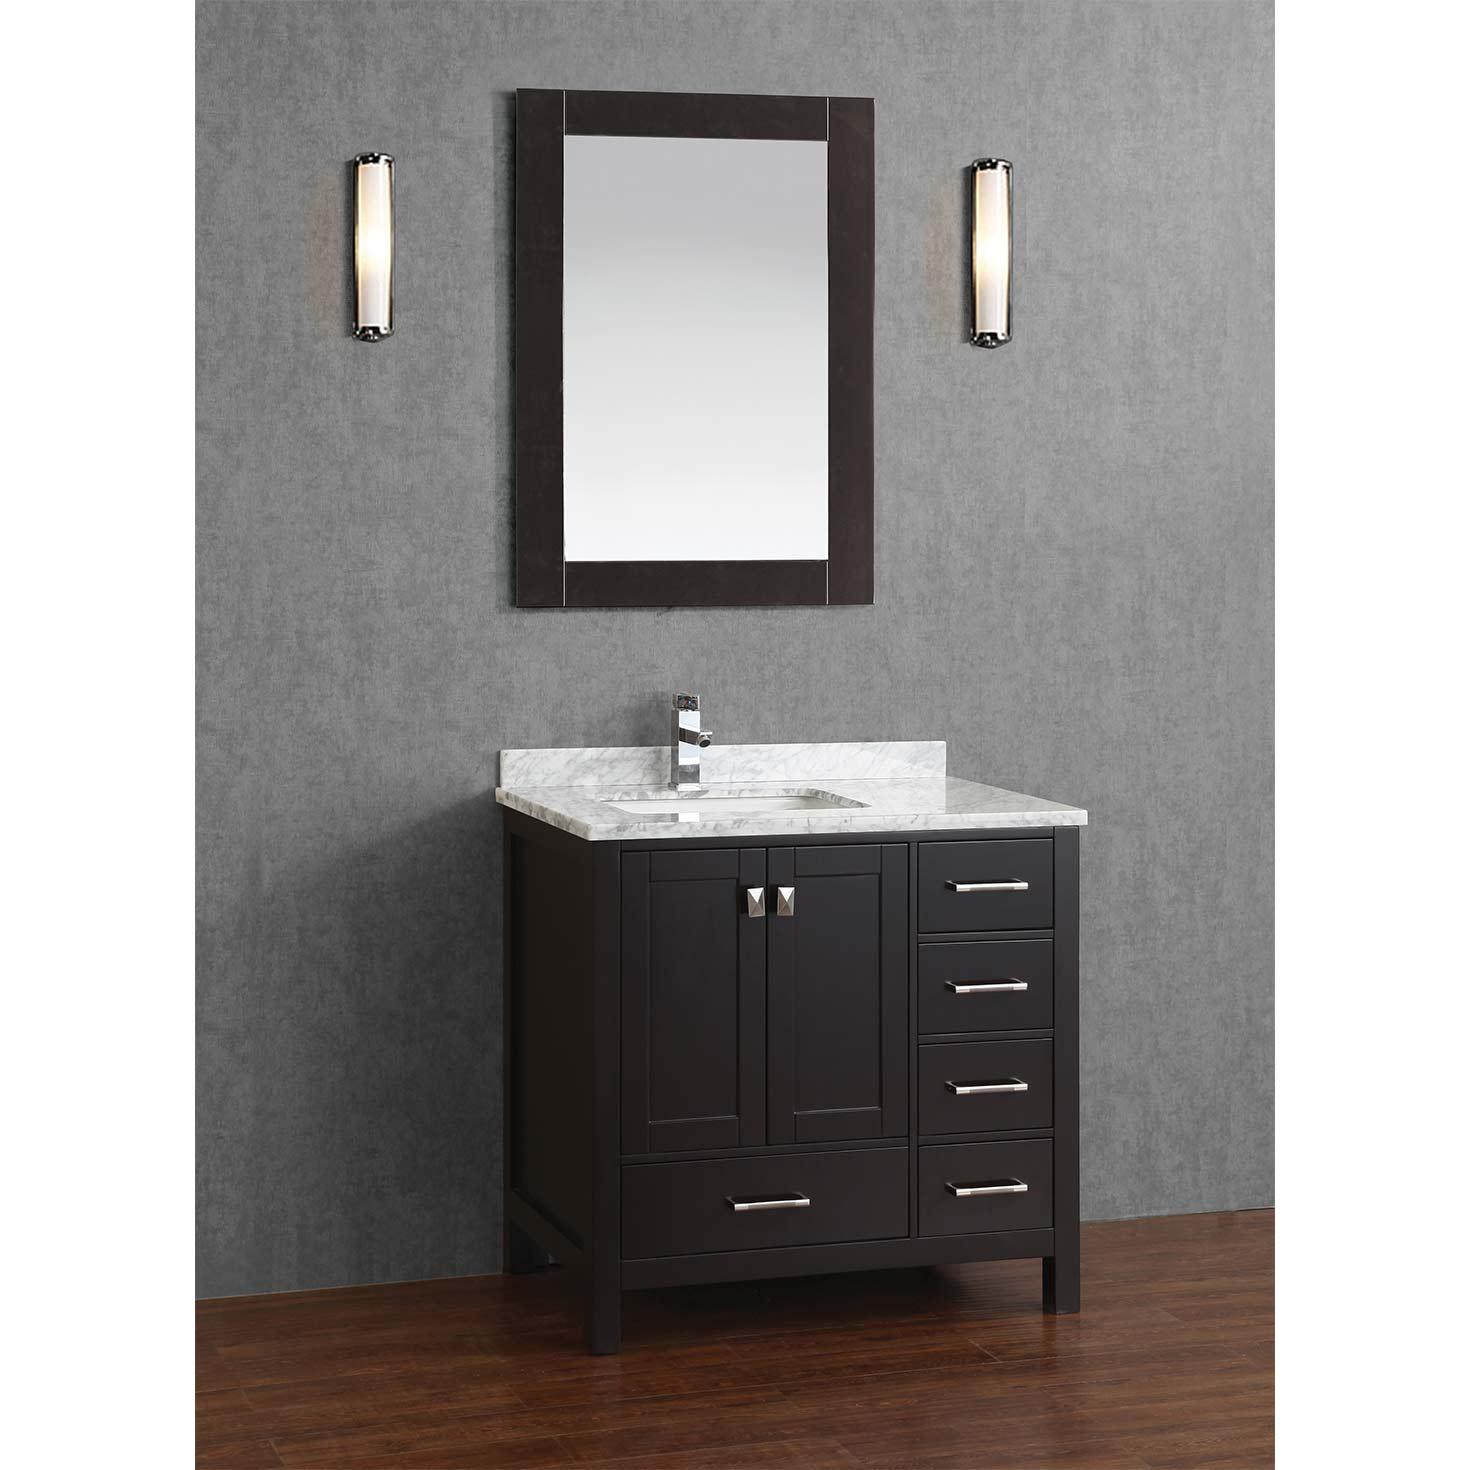 Bathroom Vanities 36 cabernet weathered oak bathroom